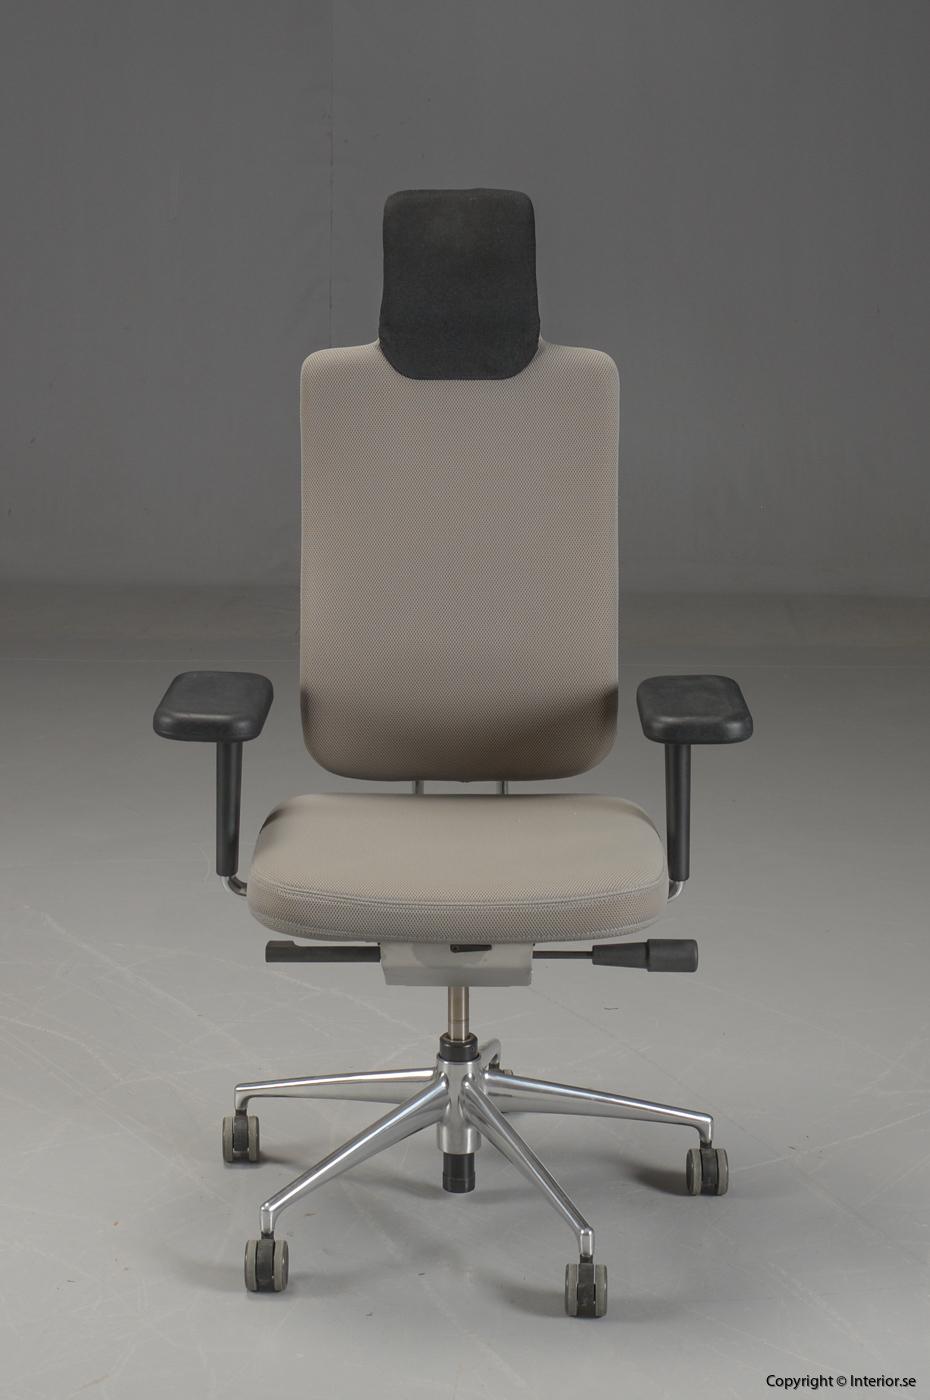 Kontorsstol, Vitra HeadLine Office Chair -   Mario & Claudio Bellini 2